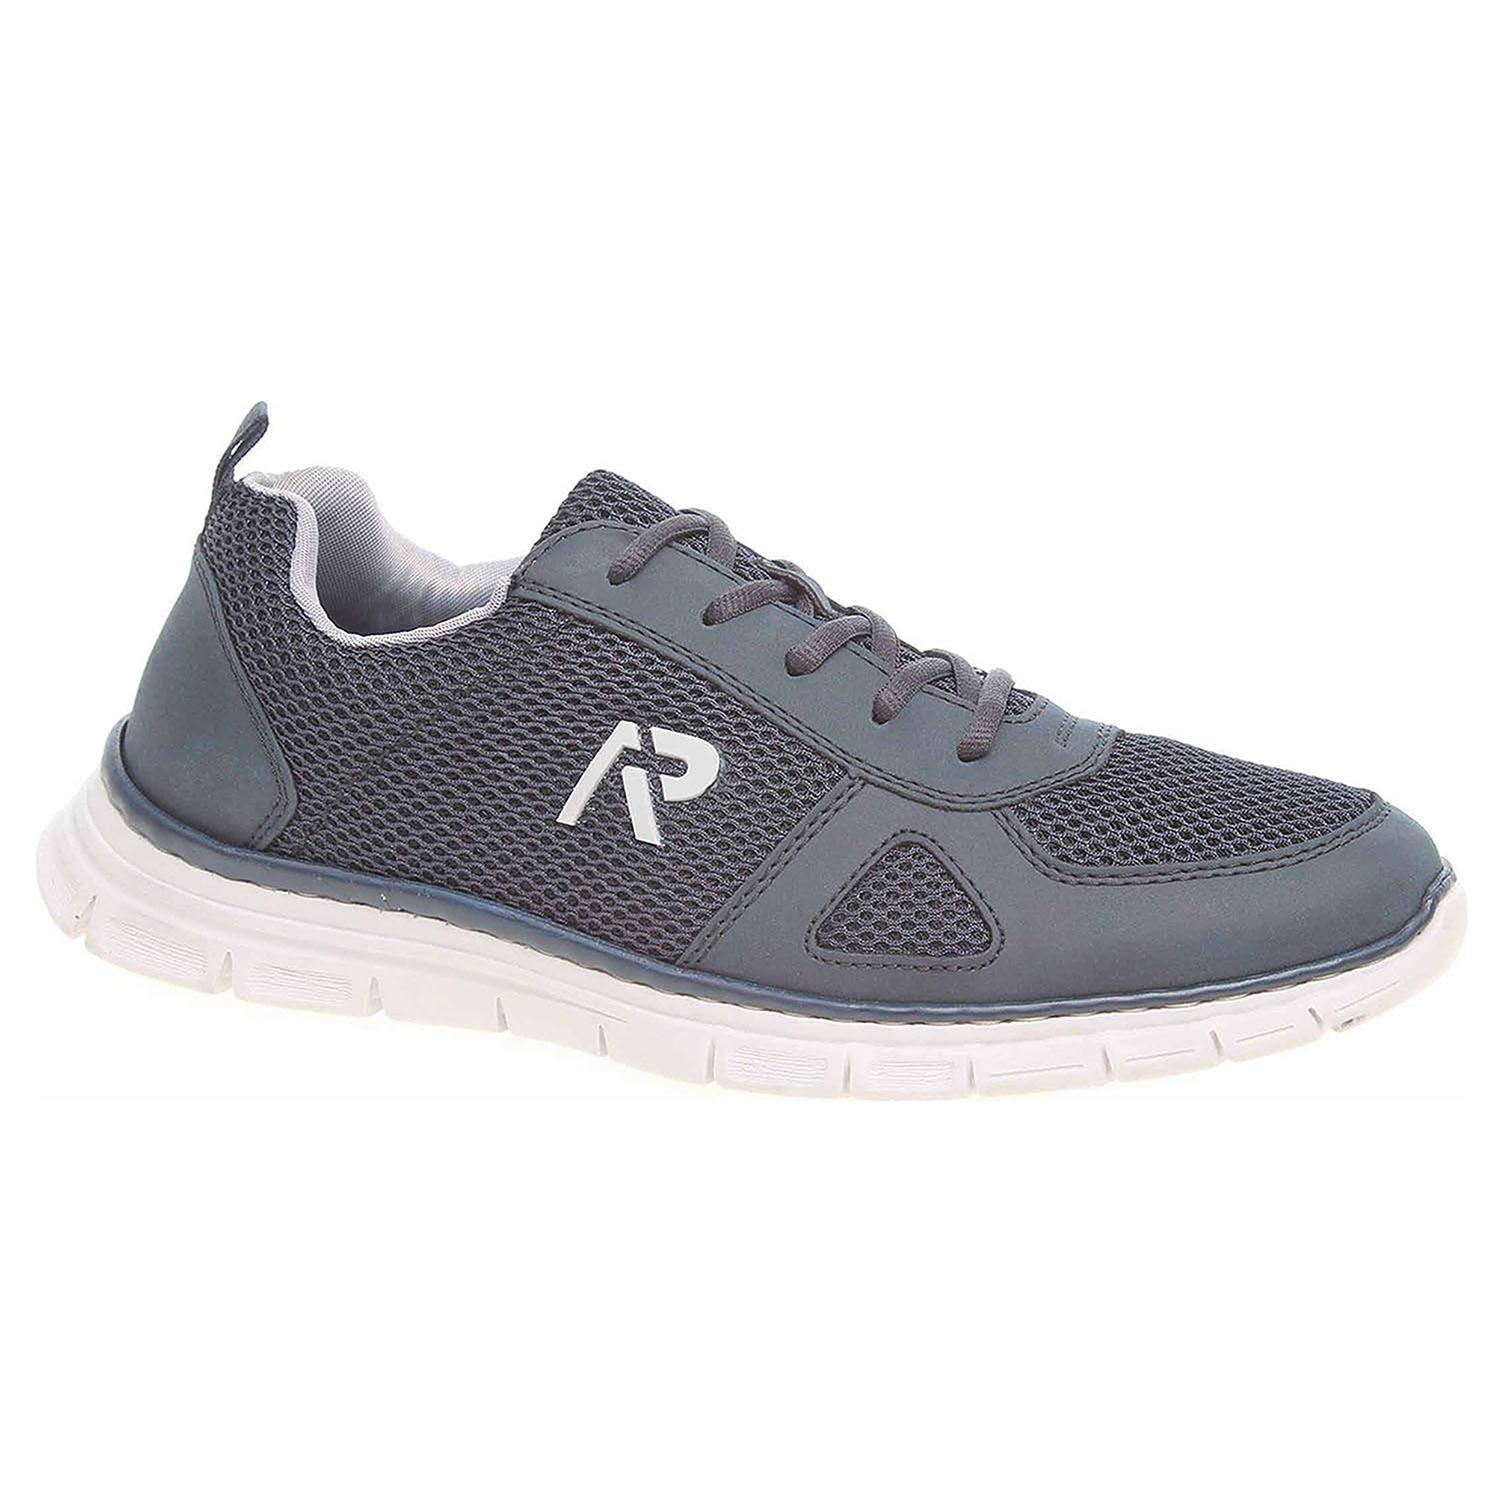 Pánská obuv Rieker B4812-14 blau B4812-14 43